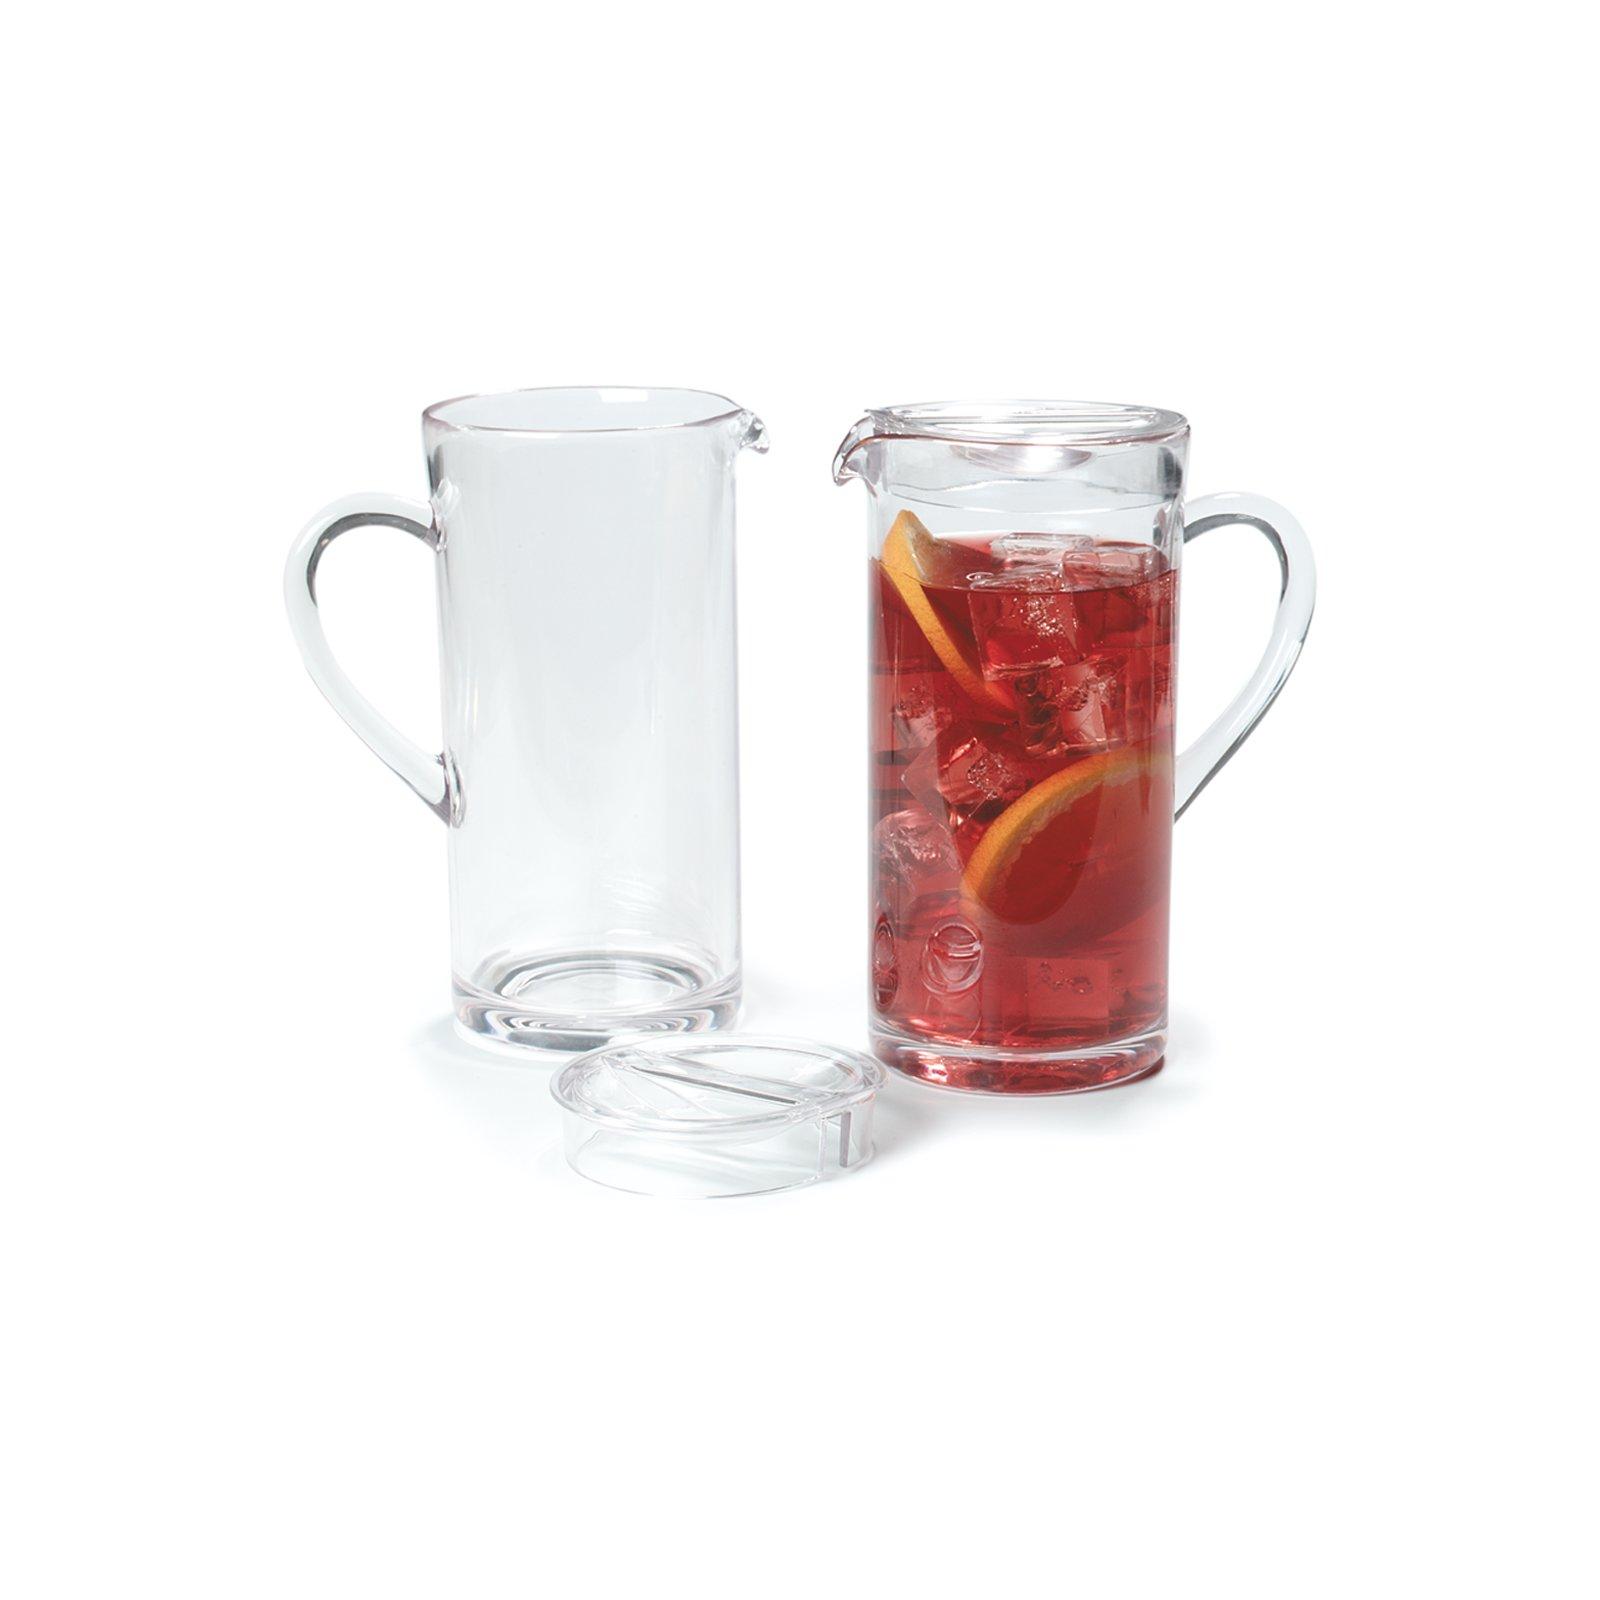 557007 elan pitcher 58 oz clear carlisle foodservice products. Black Bedroom Furniture Sets. Home Design Ideas